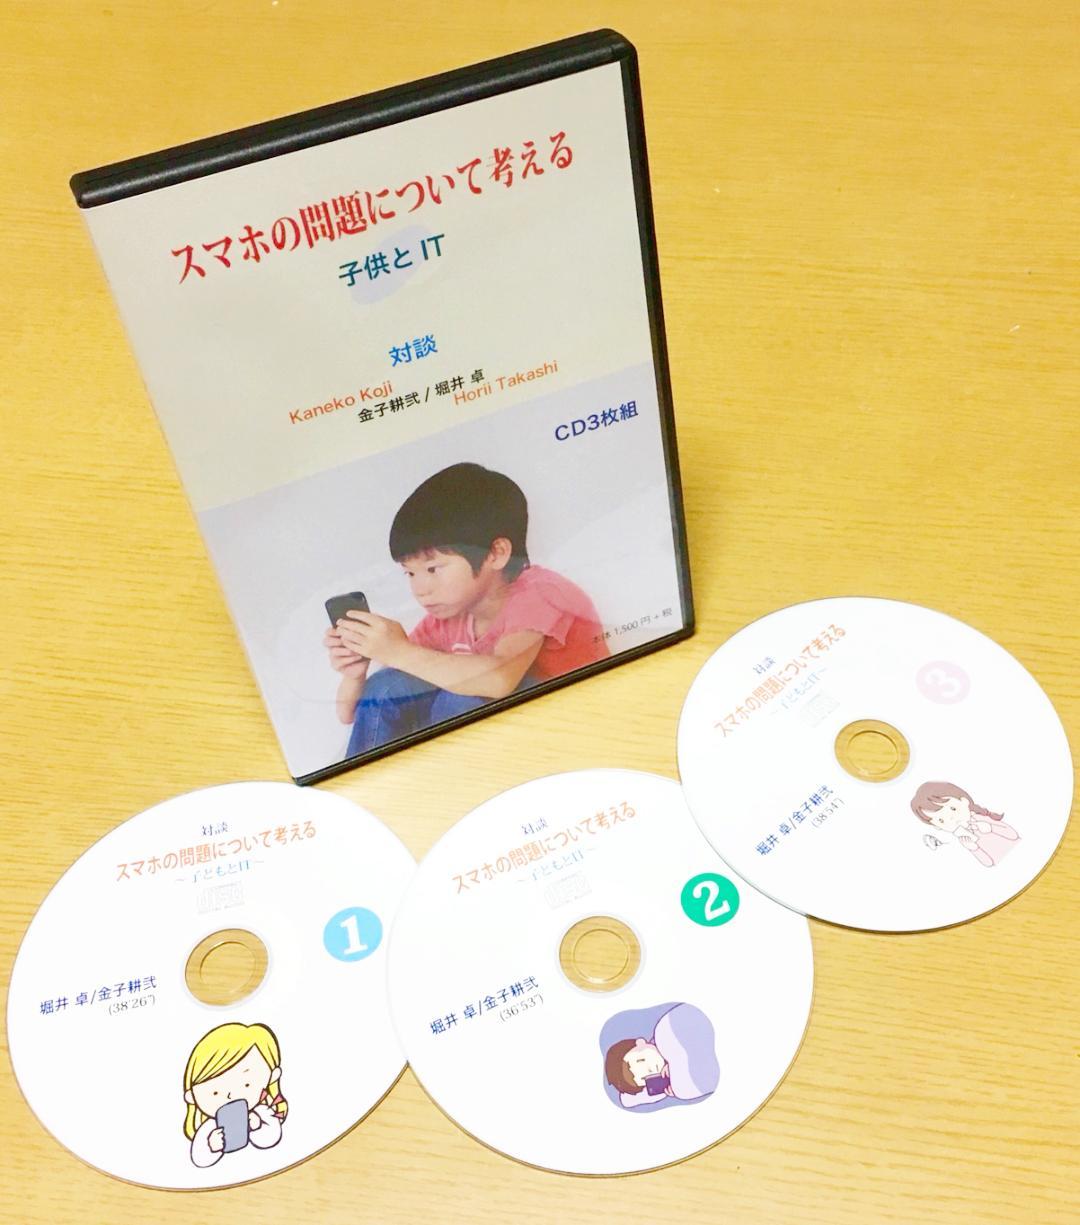 ITの専門家と金子耕弐の対談CD3枚画像